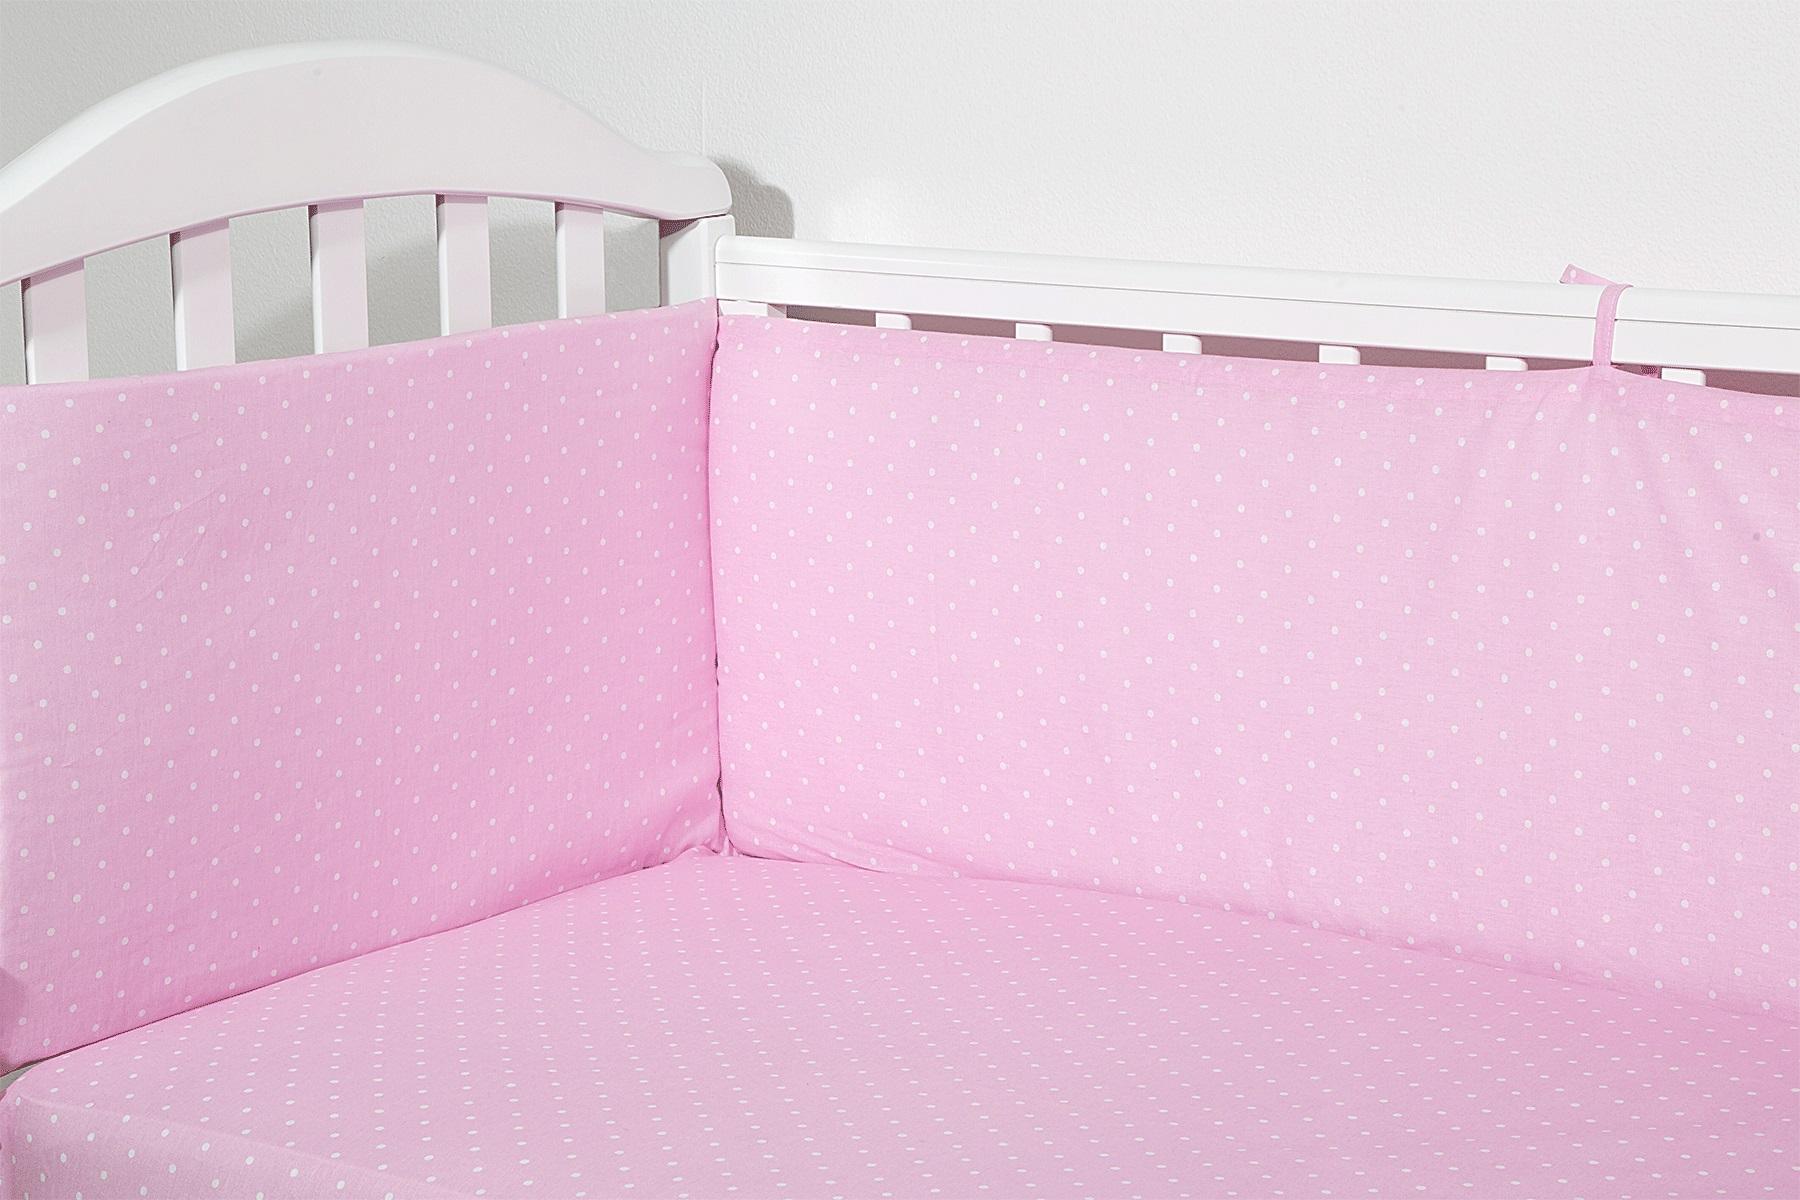 Baby Nice Бортик для кровати Горох цвет розовый -  Бортики, бамперы